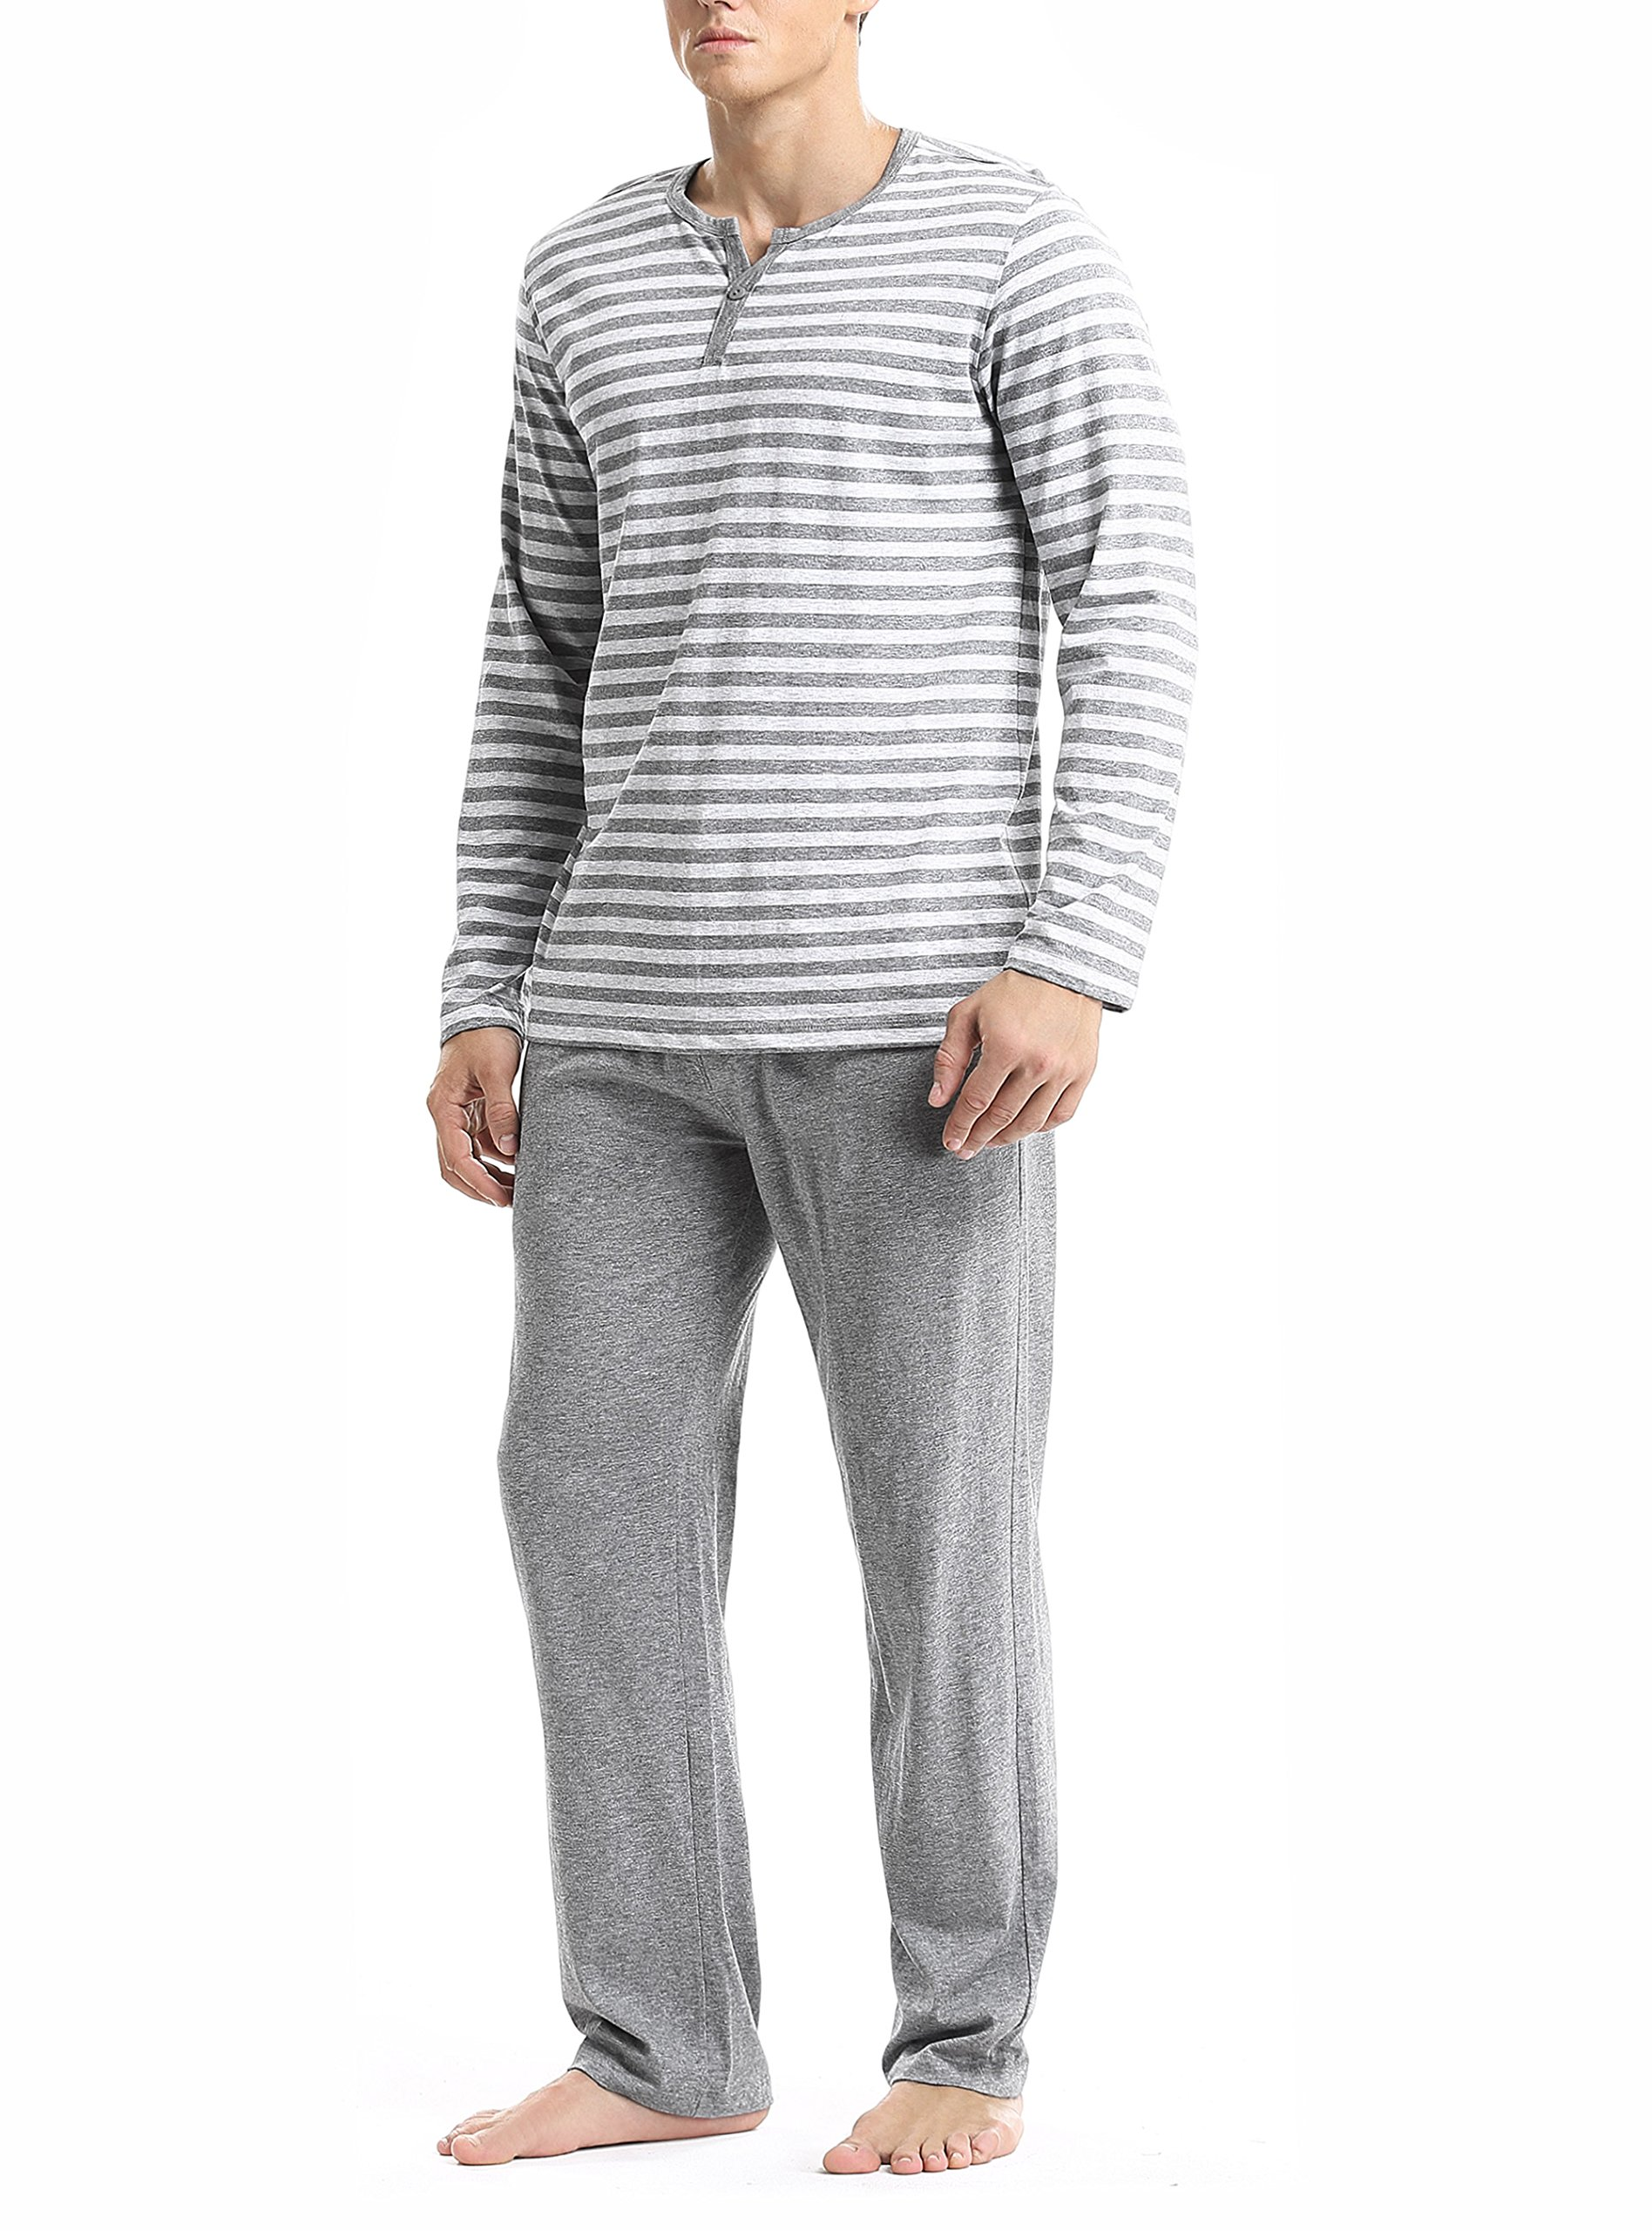 David Archy Men's Cotton Heather Striped Sleepwear Long Sleeve Top & Bottom Pajama Set (Heather Dark Gray, M)